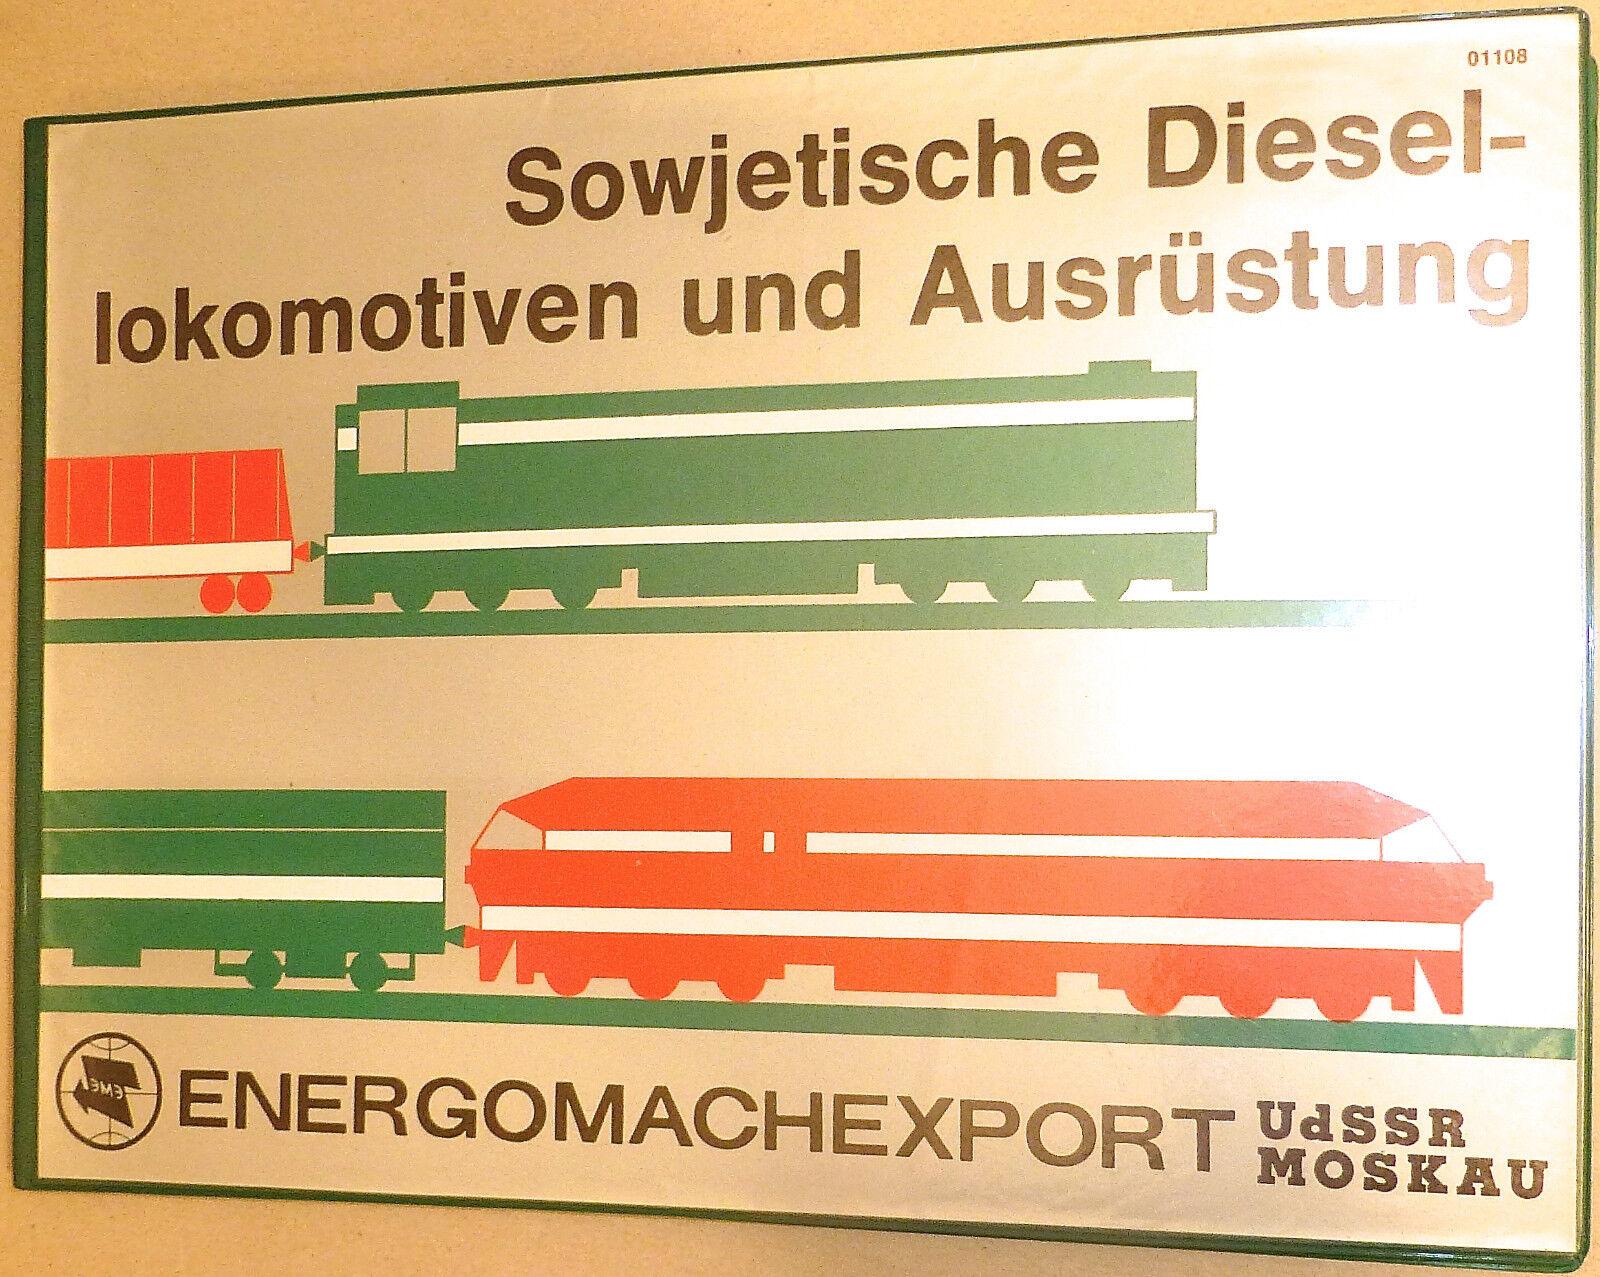 Sovietica Diesel Locomotive e attrezzature energomachexport URSS MOSCA Å *